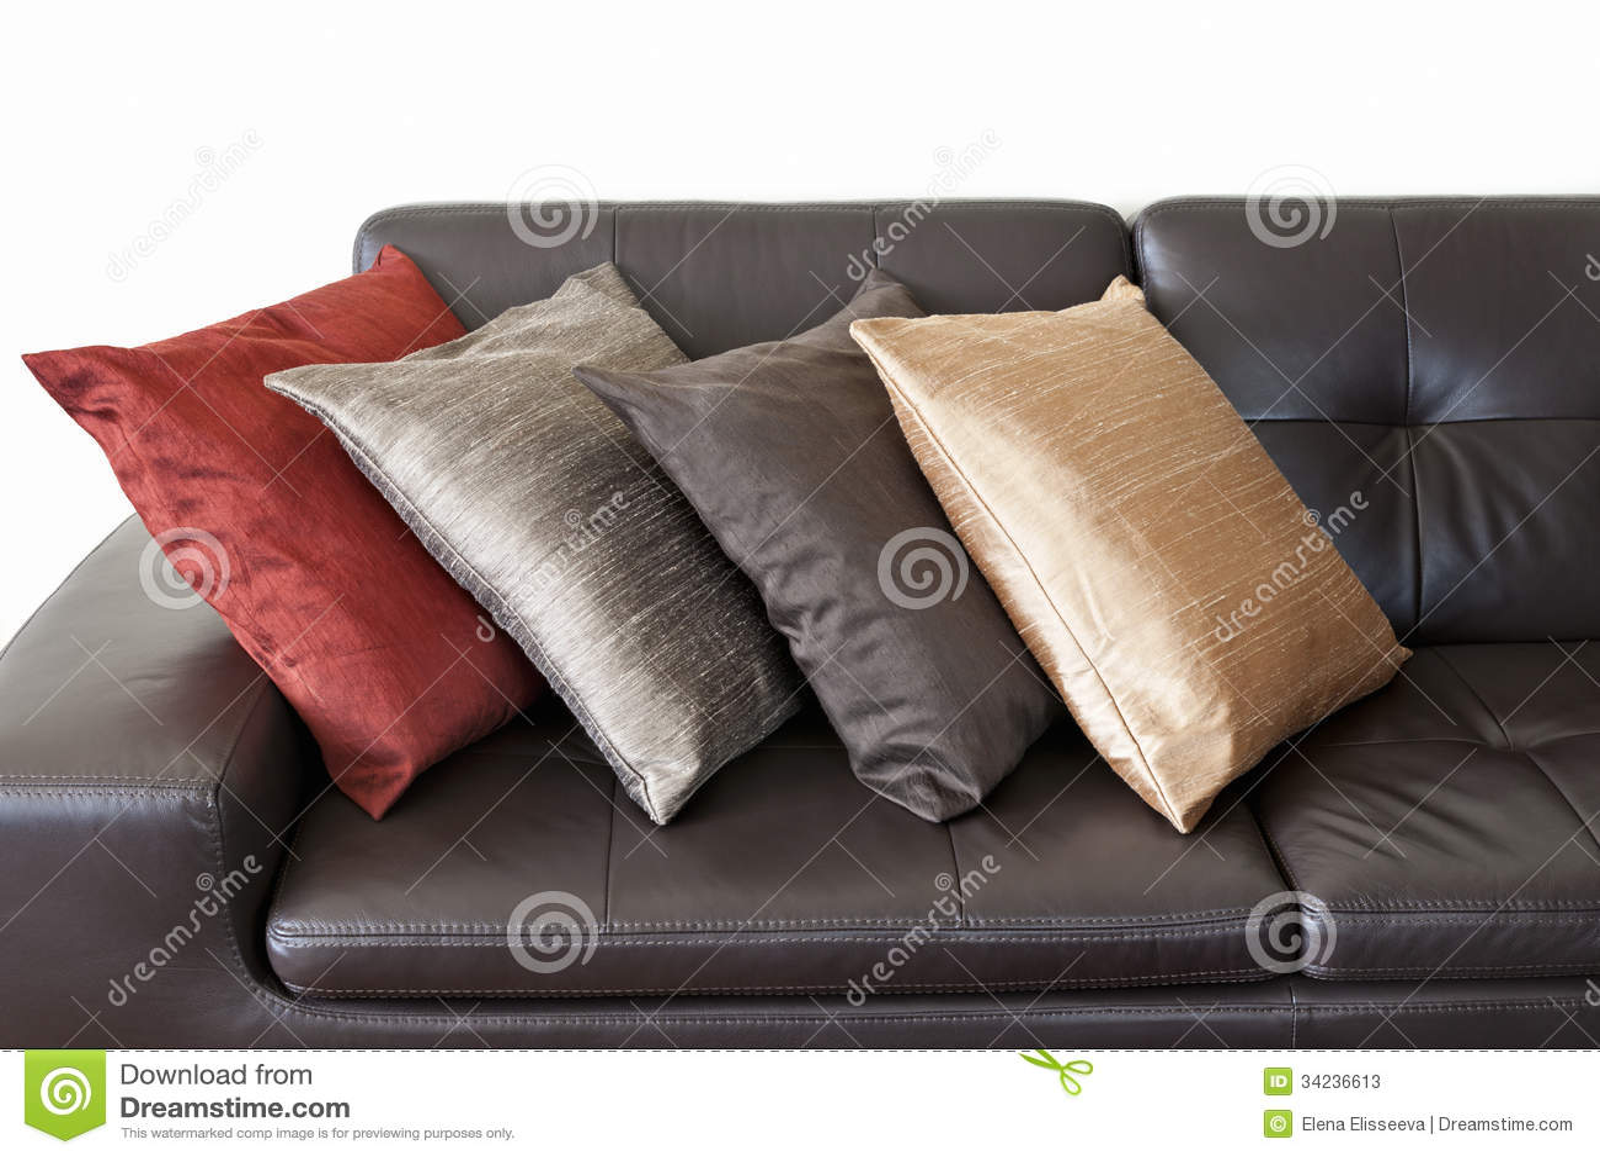 Cushions On Leather Sofa Stock Photos Image 34236613